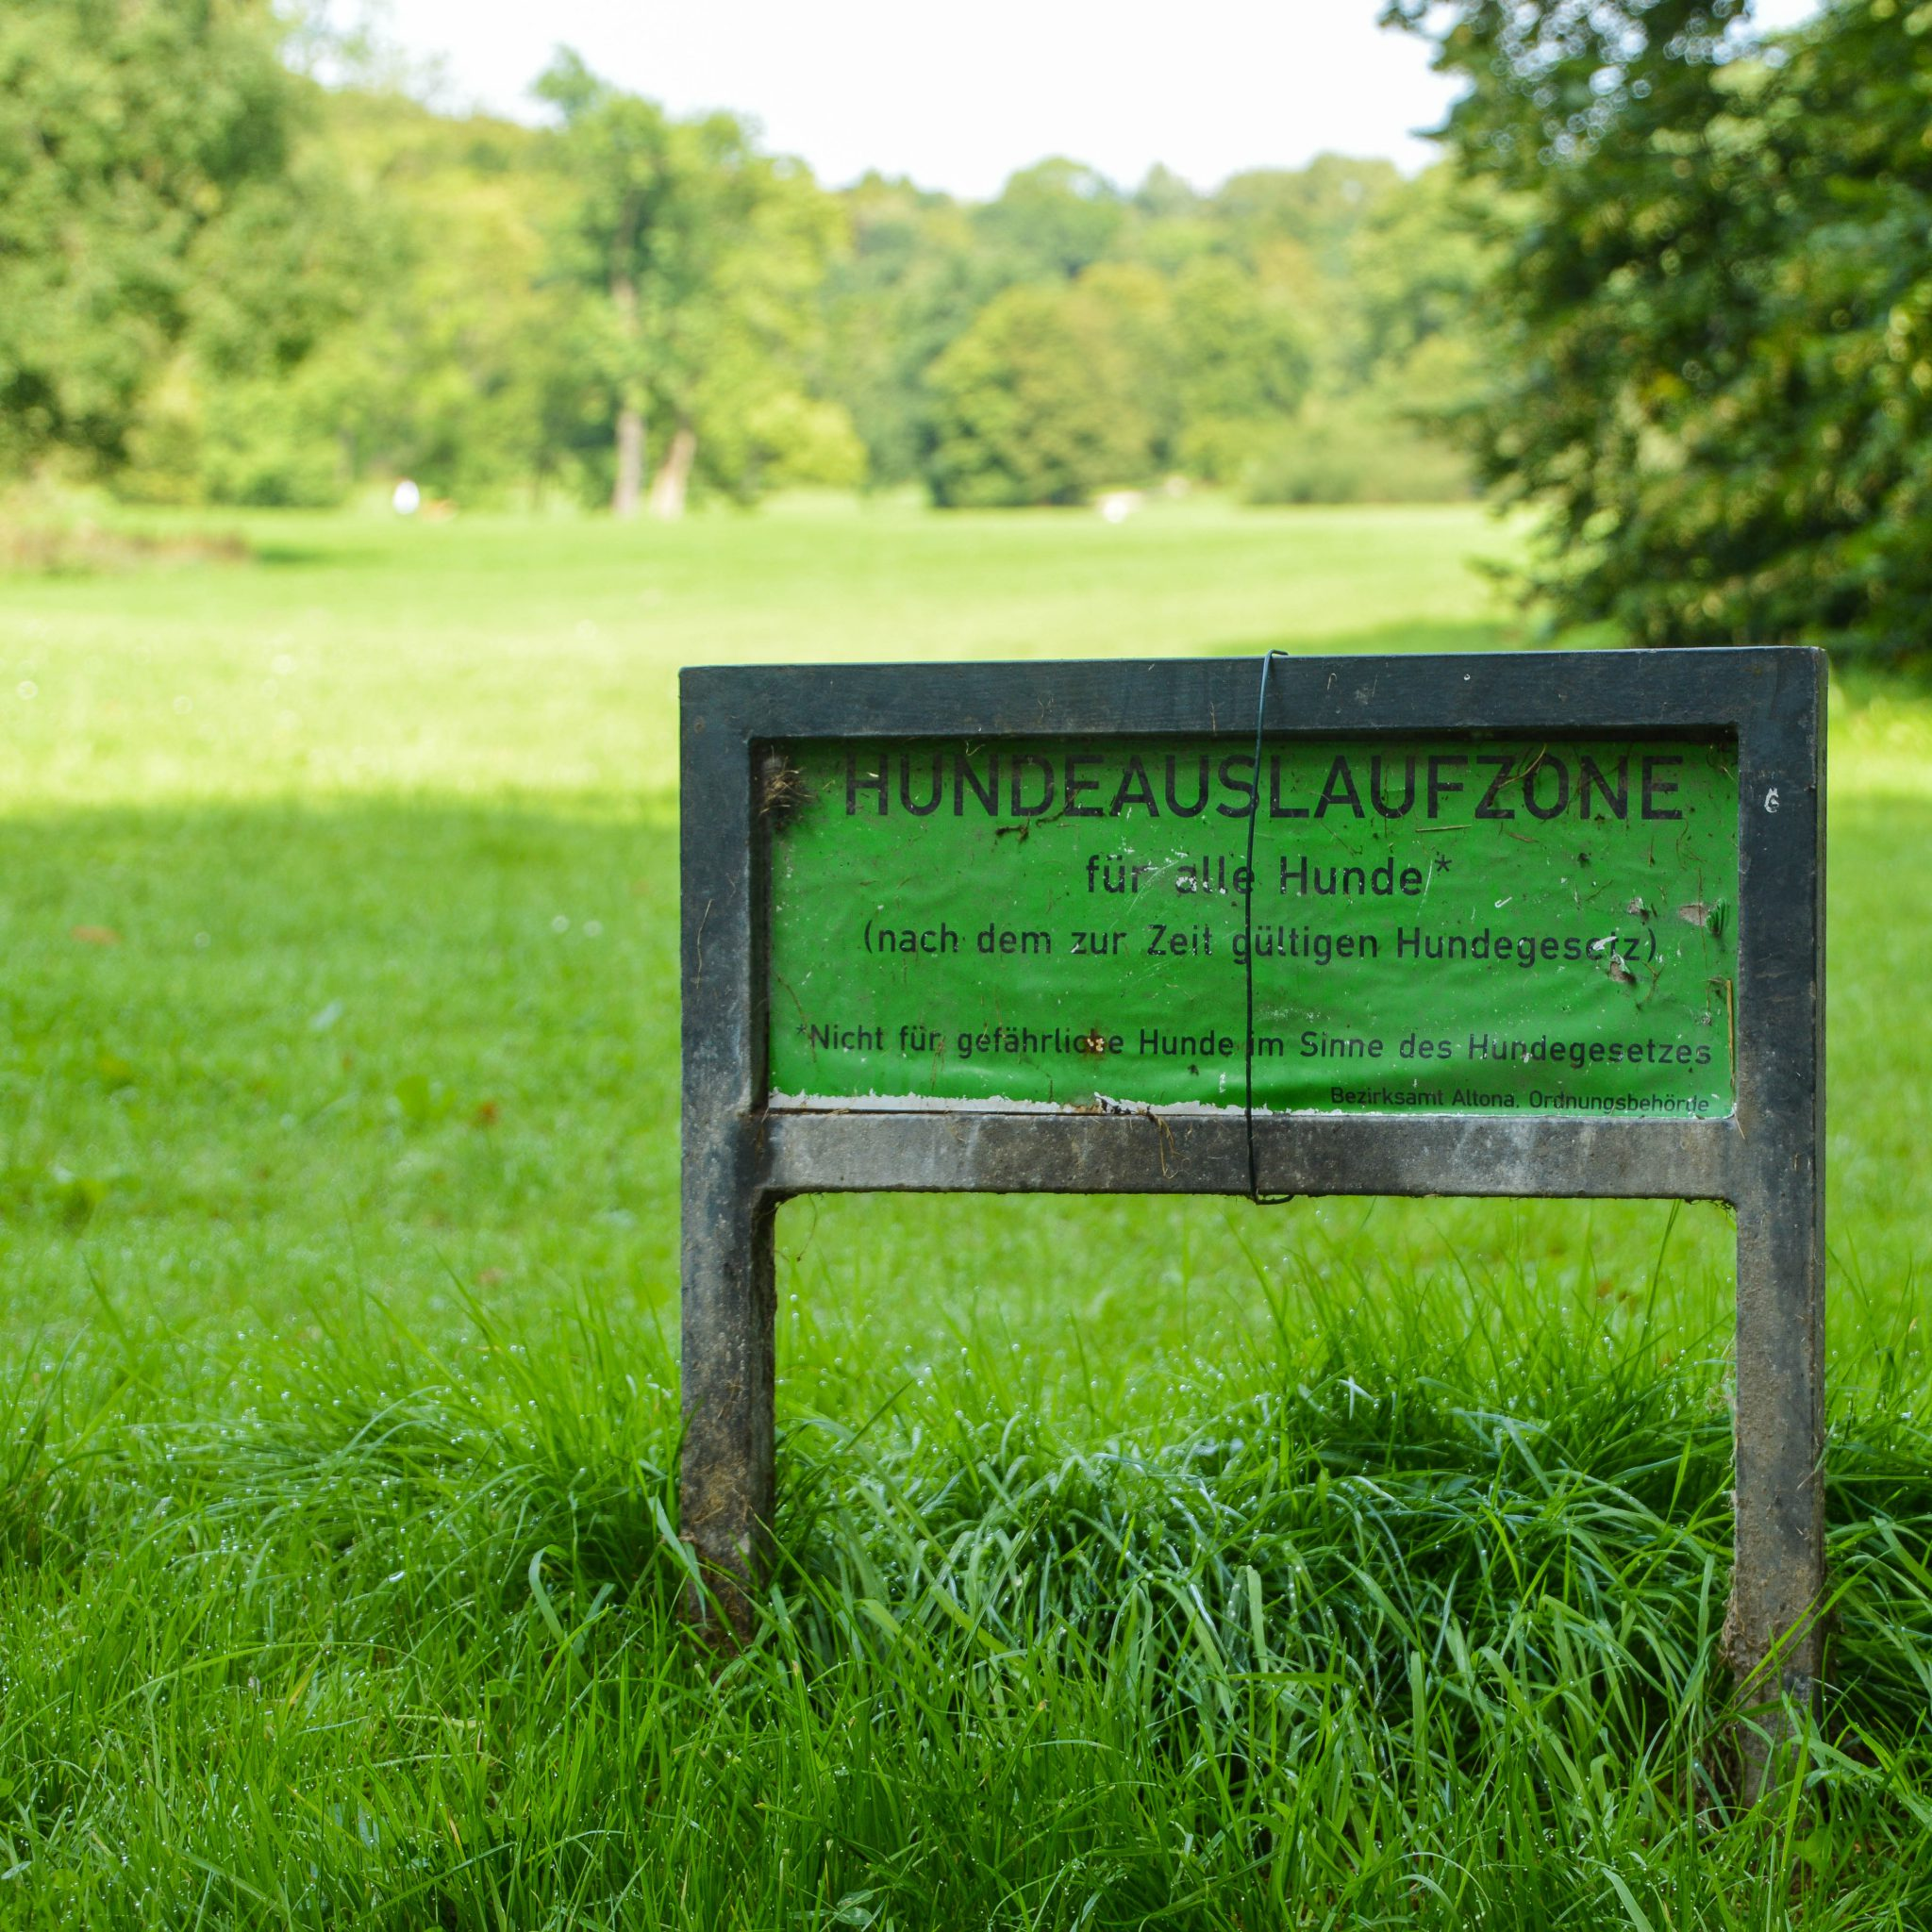 Jenischpark und Hundeauslaufzonen